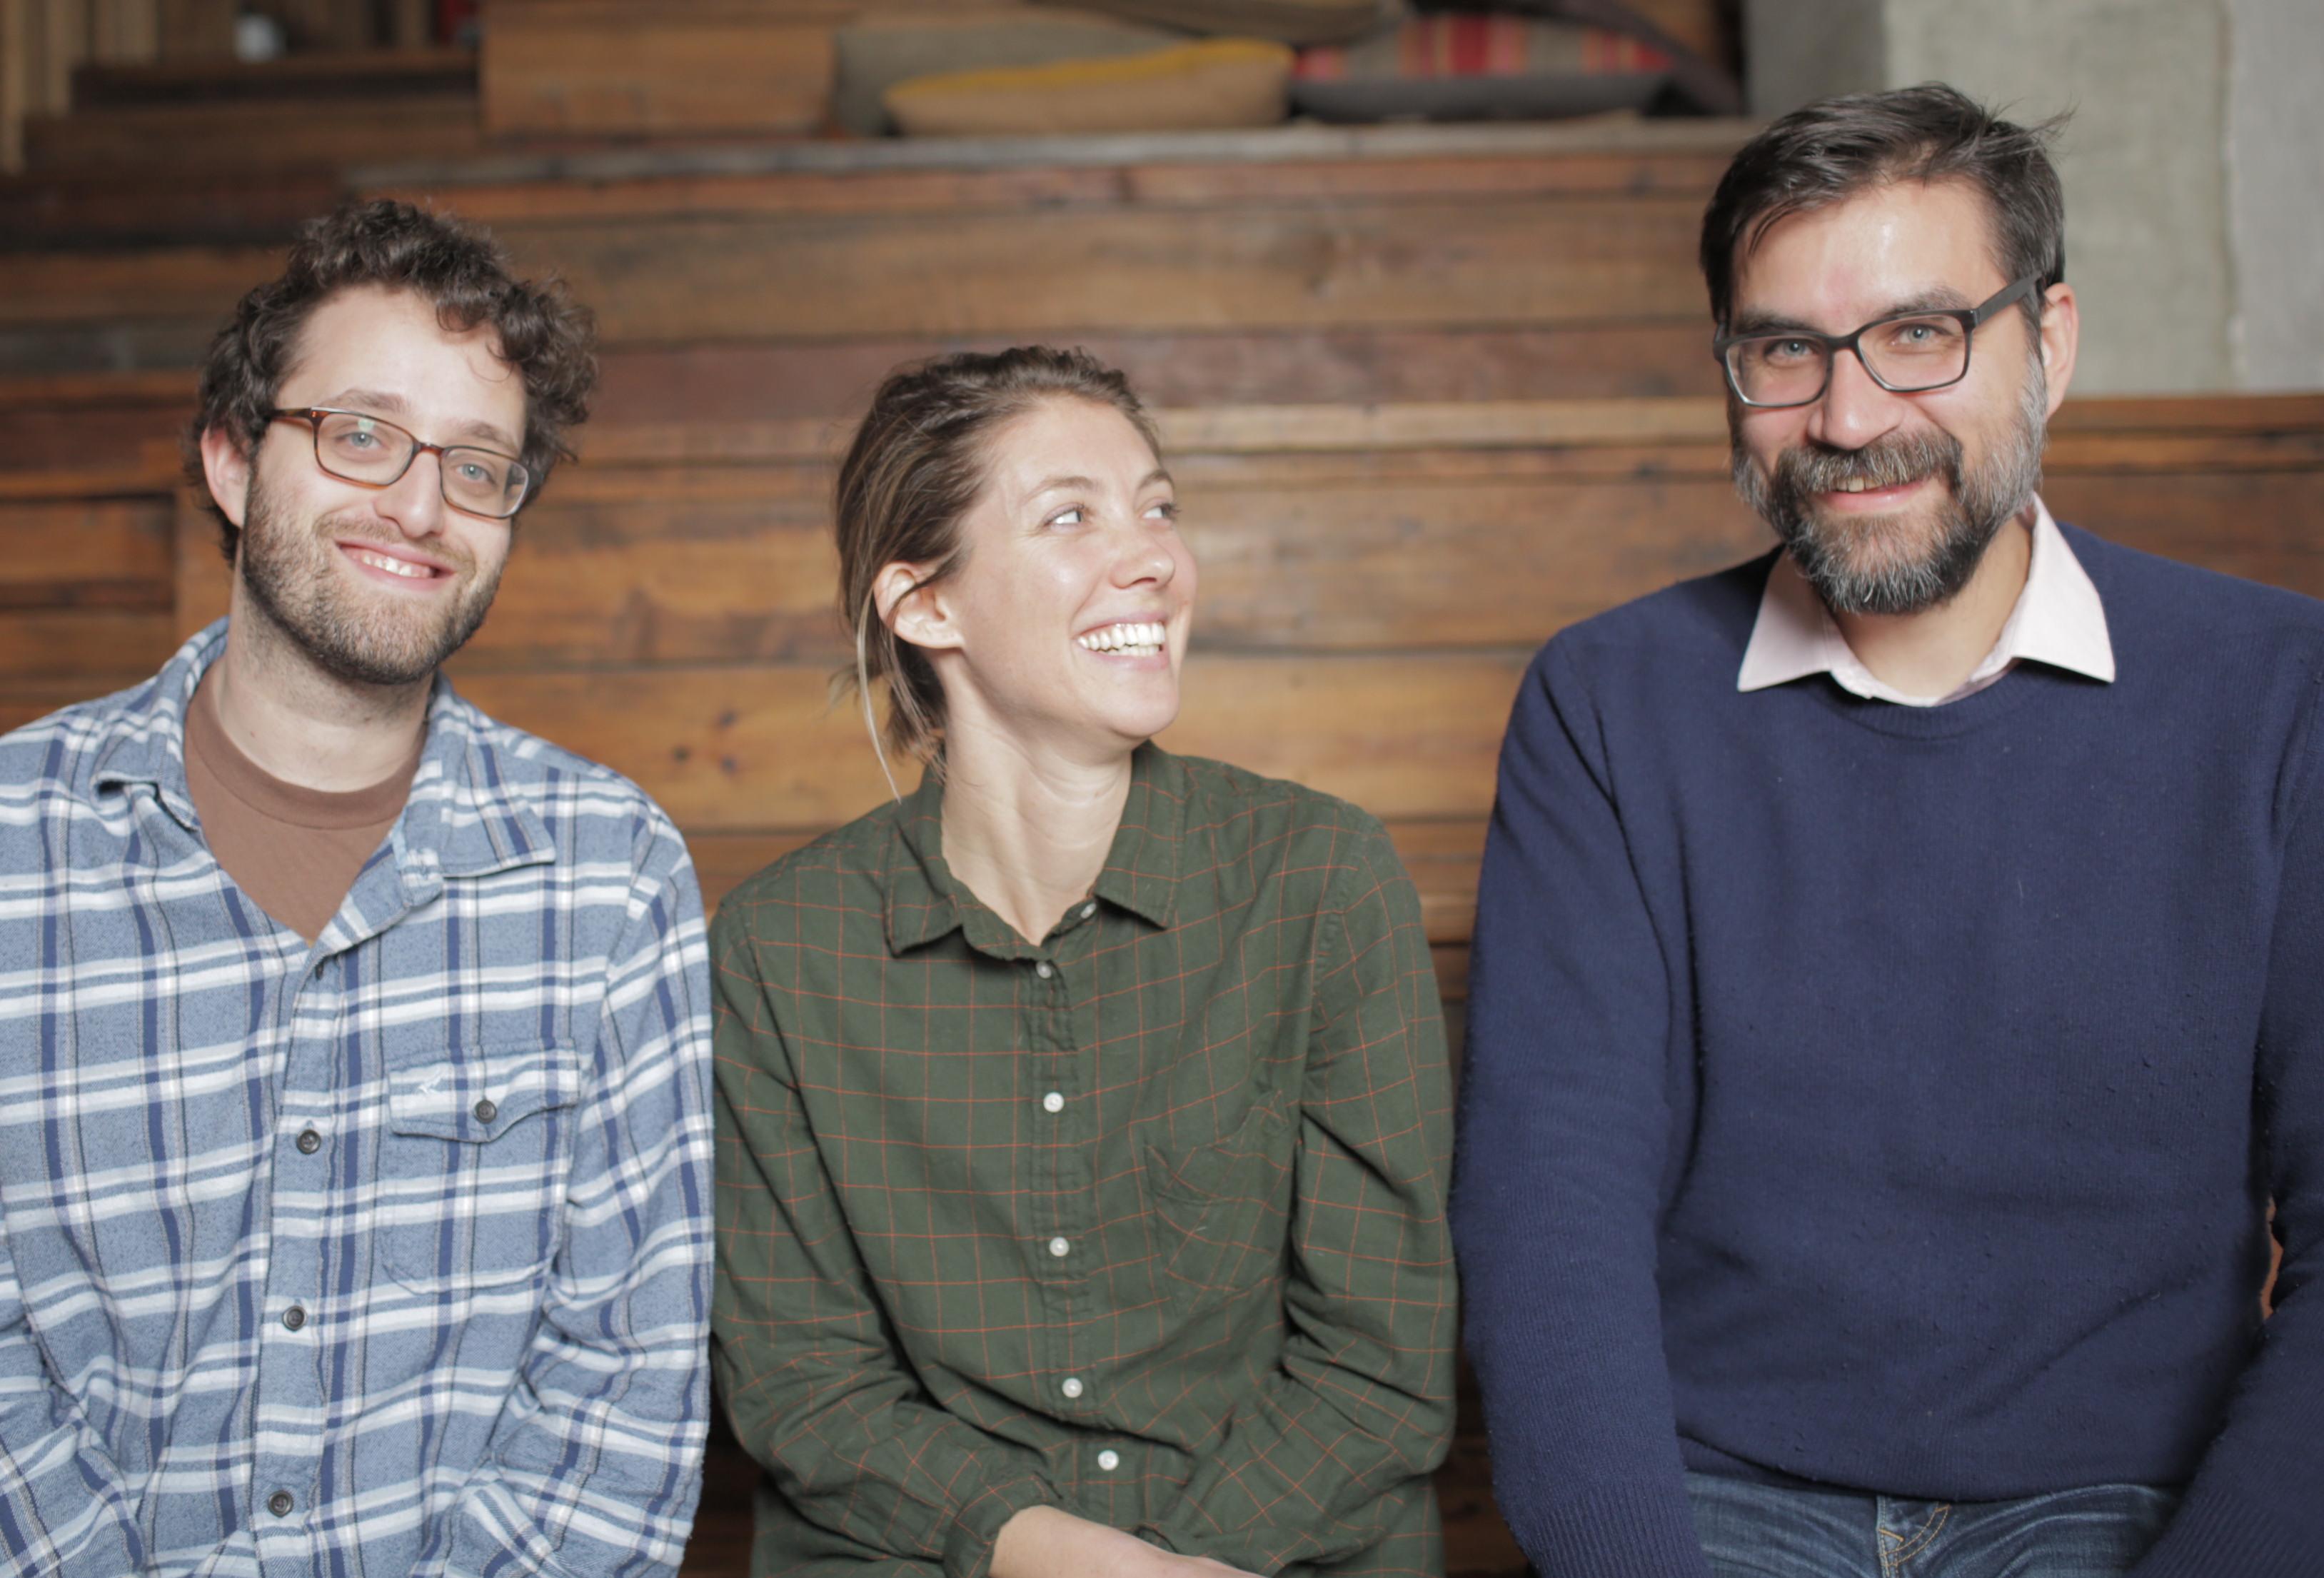 Kickstarter's Film Outreach Team: Dan Schoenbrun (Narrative), Liz Cook (Documentary), George Schmalz (Genre)